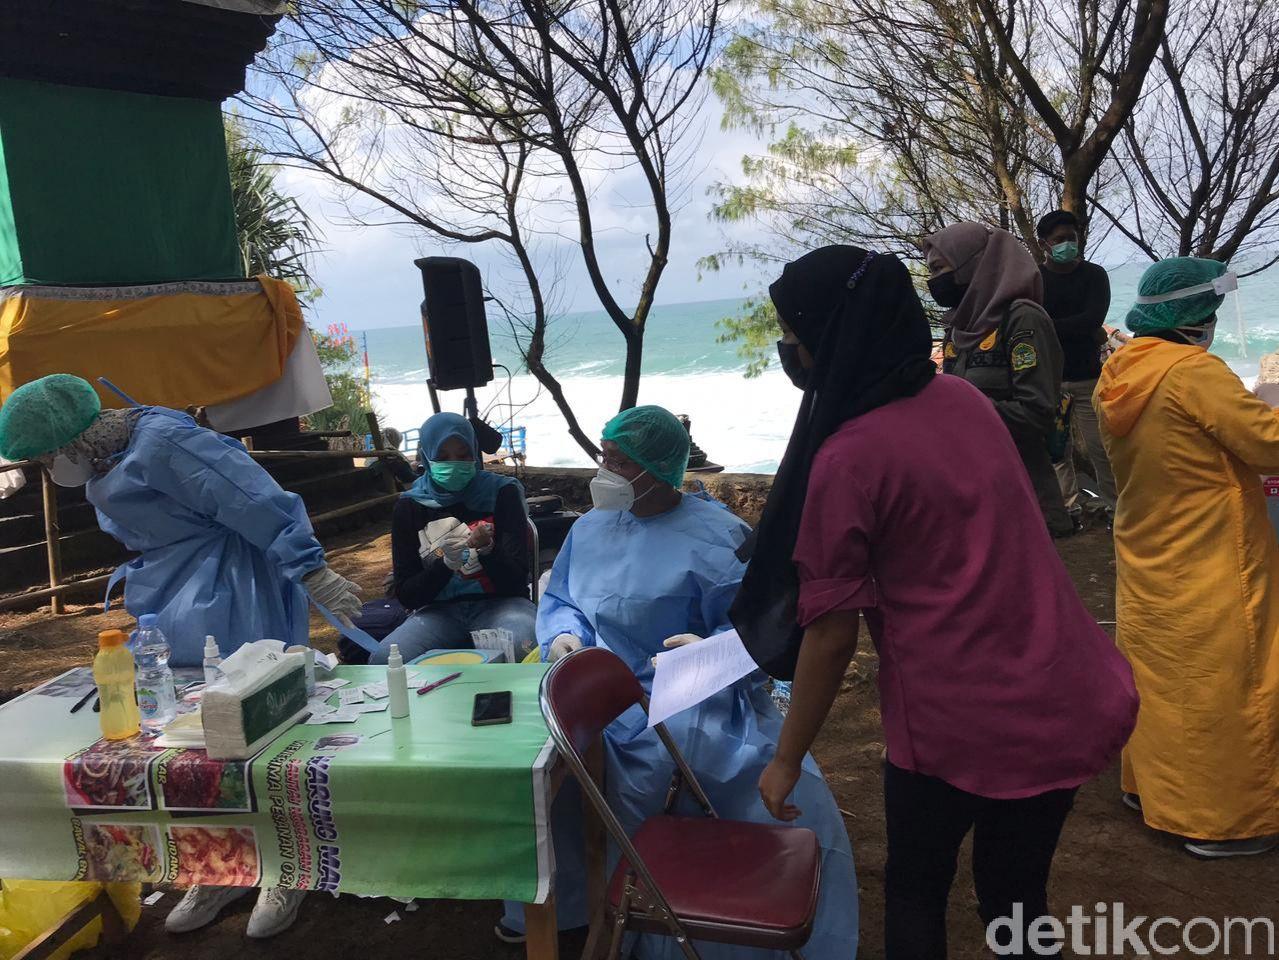 Suasana vaksinasi COVID-19 di Pantai Ngobaran, Kalurahan Kanigoro, Kapanewon Saptosari, Gunungkidul.